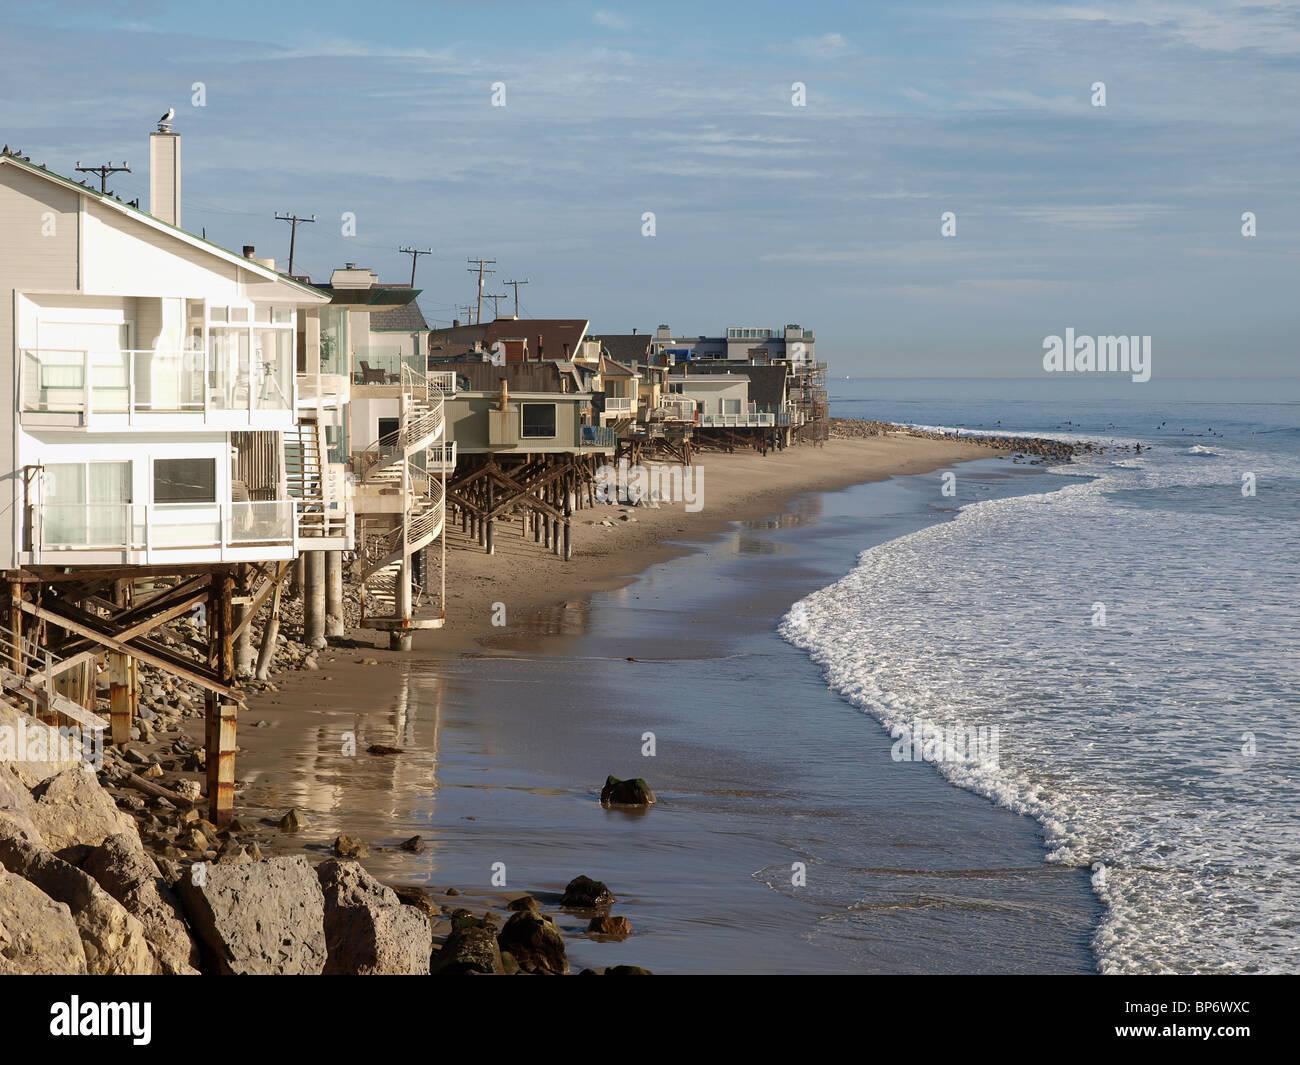 A row of beach front homes enjoying the warm California sun. - Stock Image